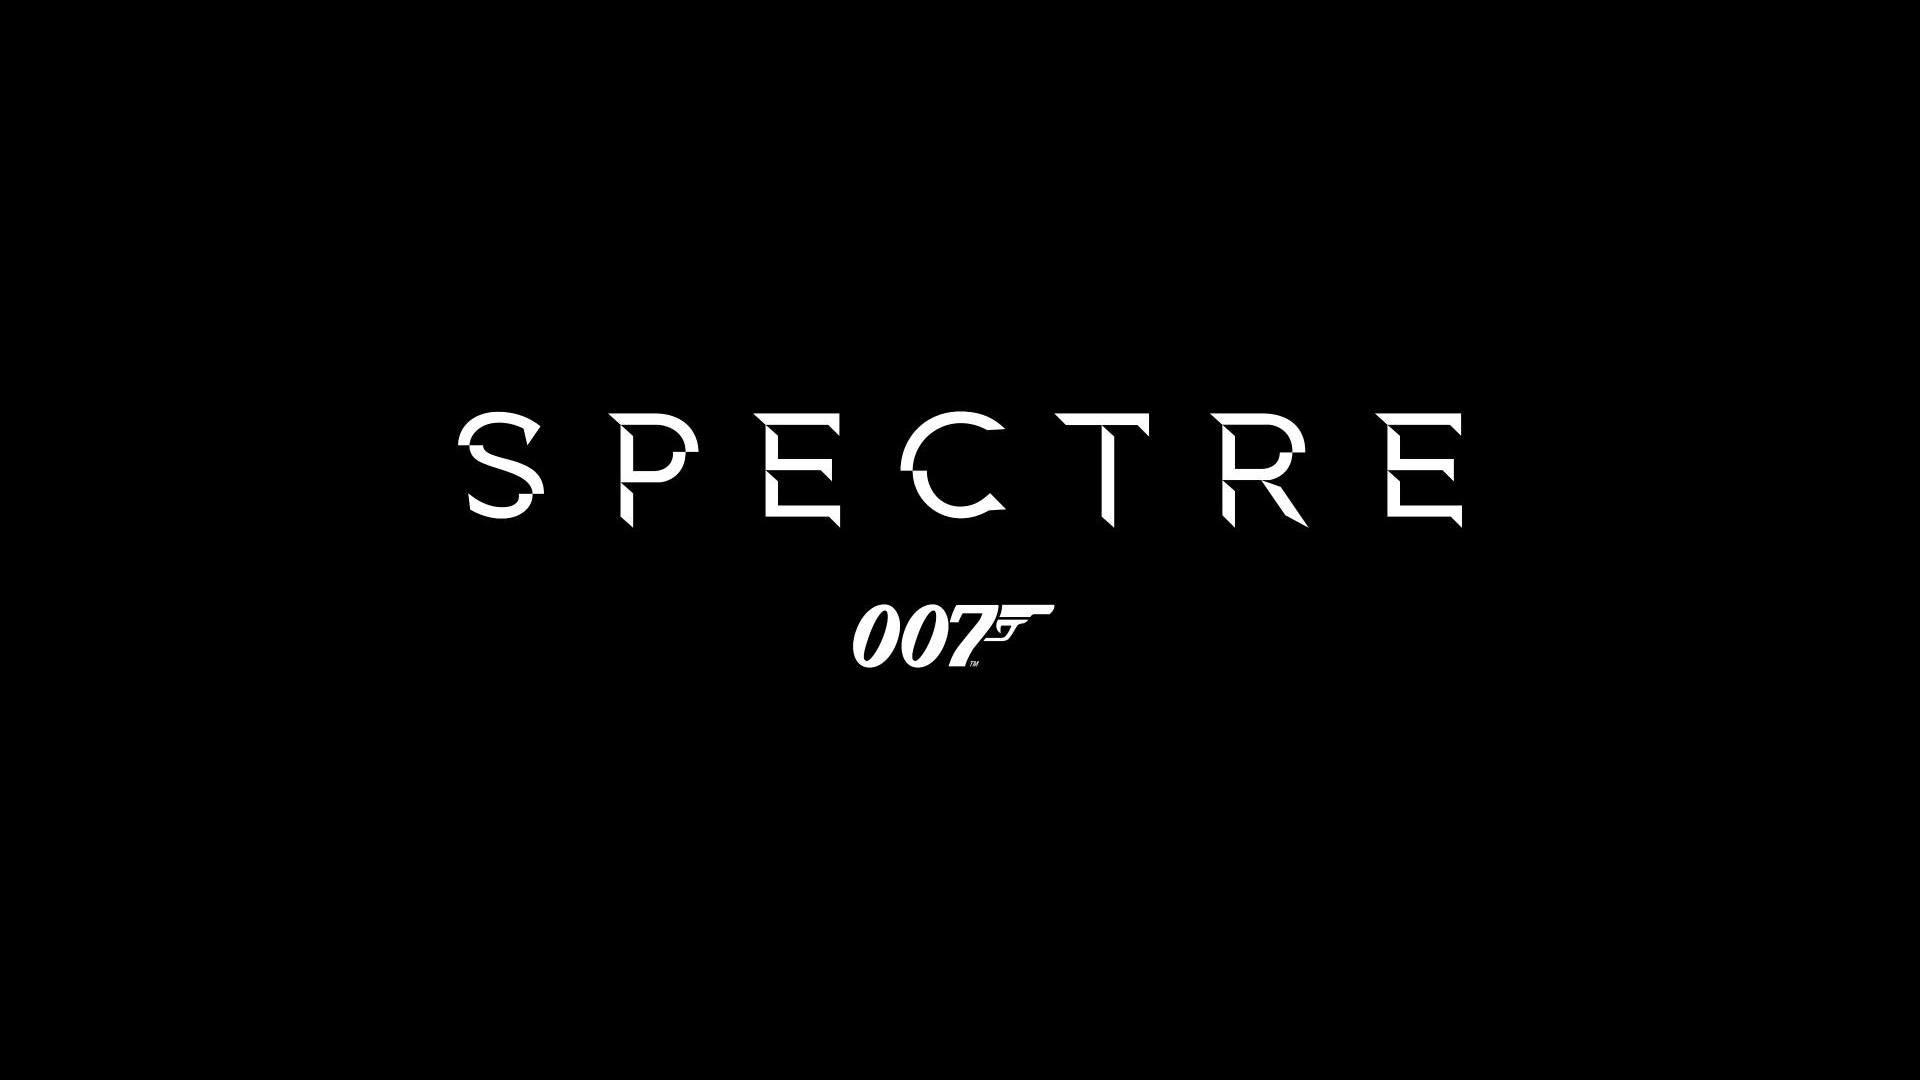 007 logo wallpaper 70 images - 007 wallpaper 4k ...